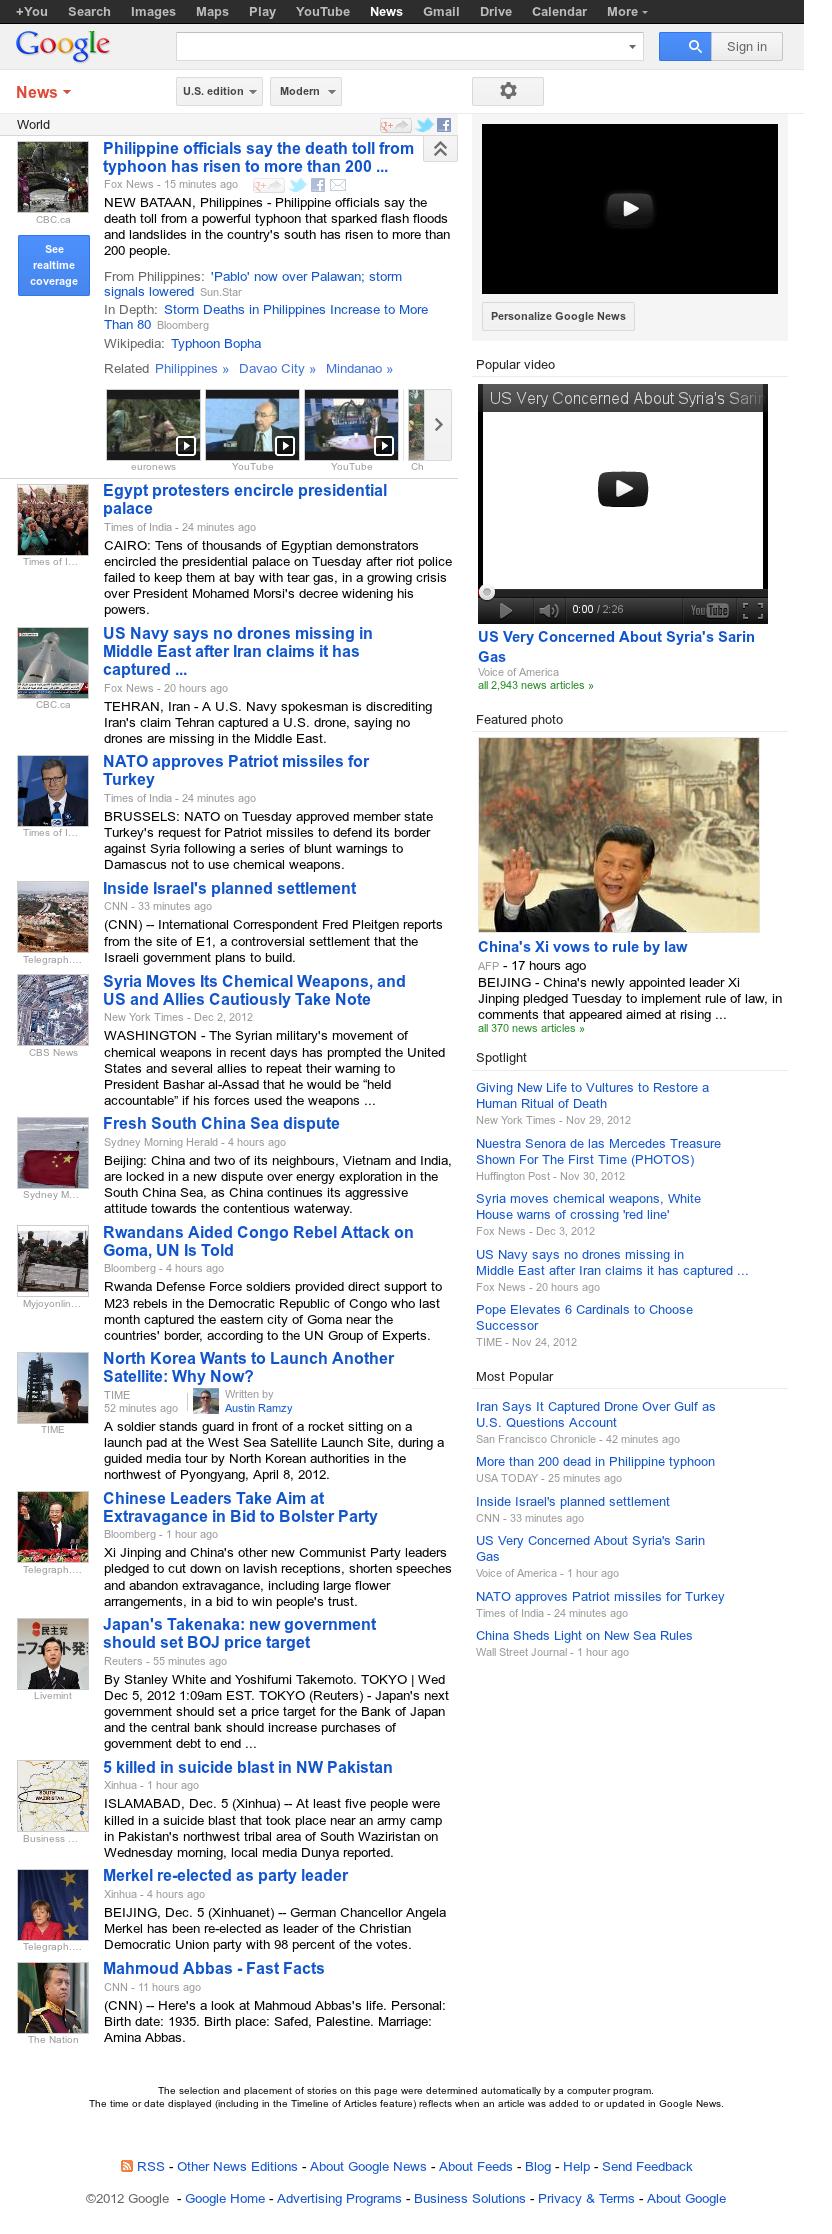 Google News: World at Wednesday Dec. 5, 2012, 7:13 a.m. UTC